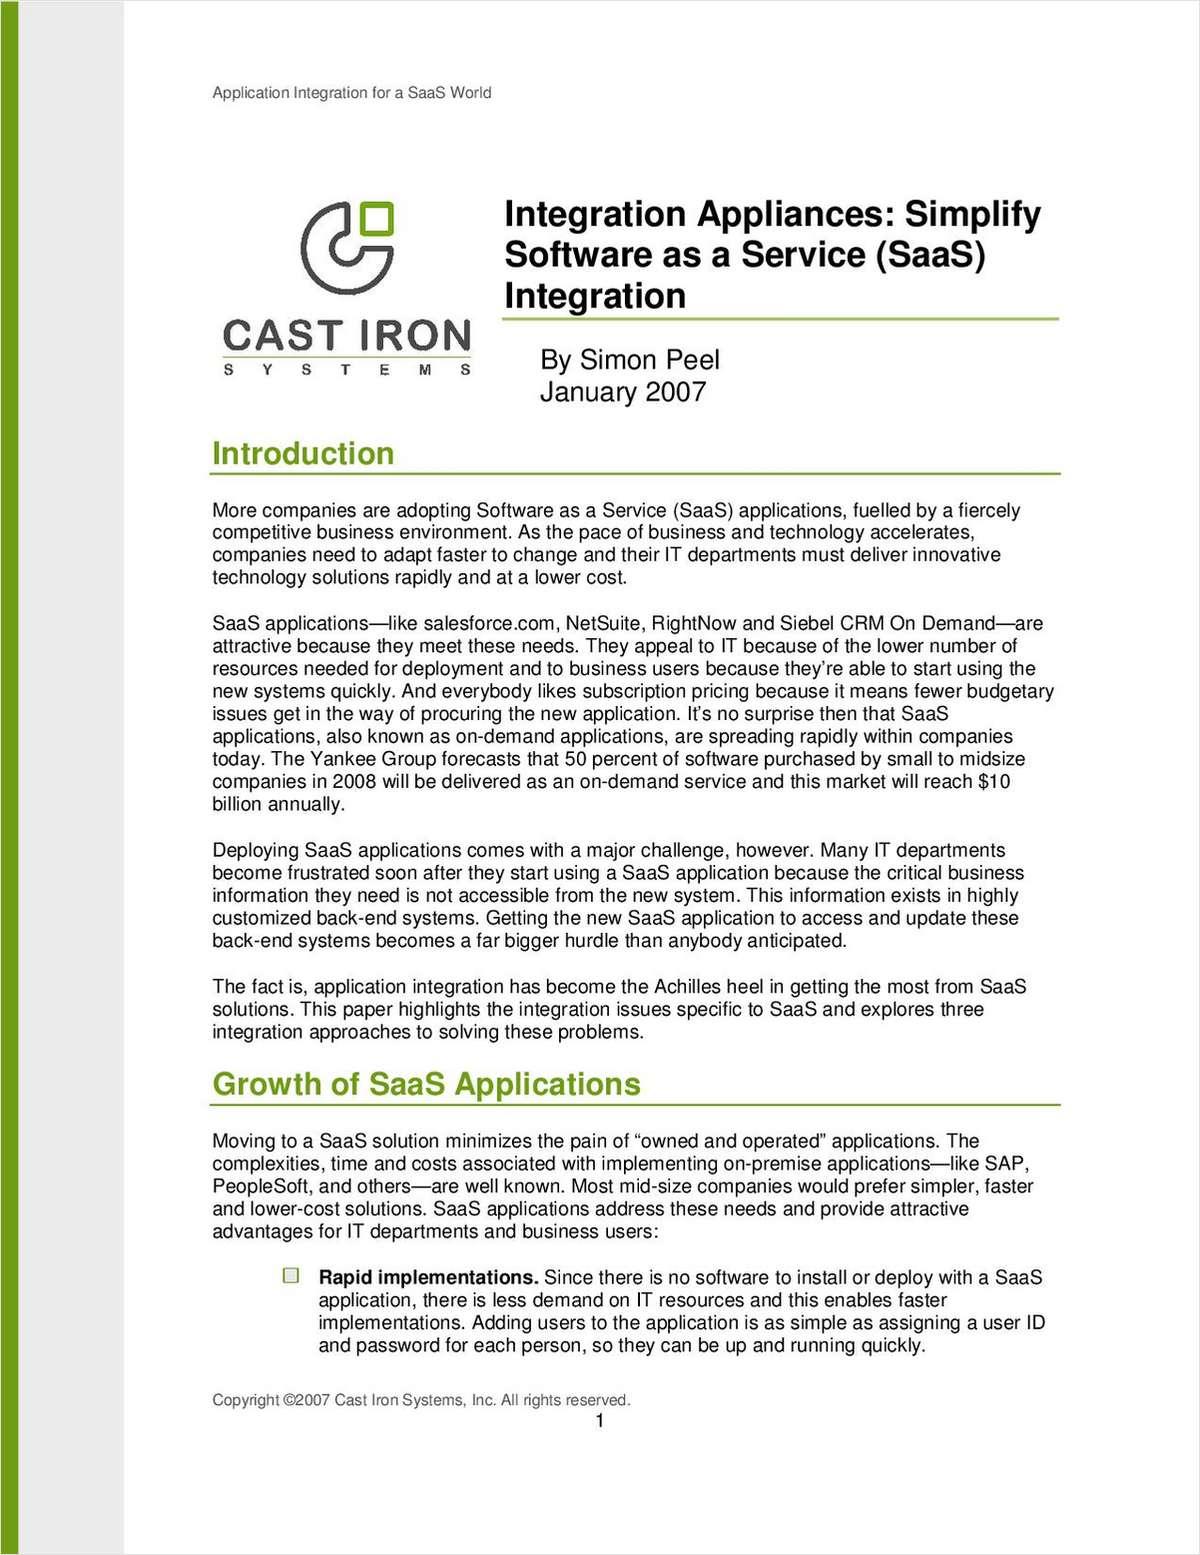 Integration Appliances: Simplify Software as a Service (SaaS)Integration